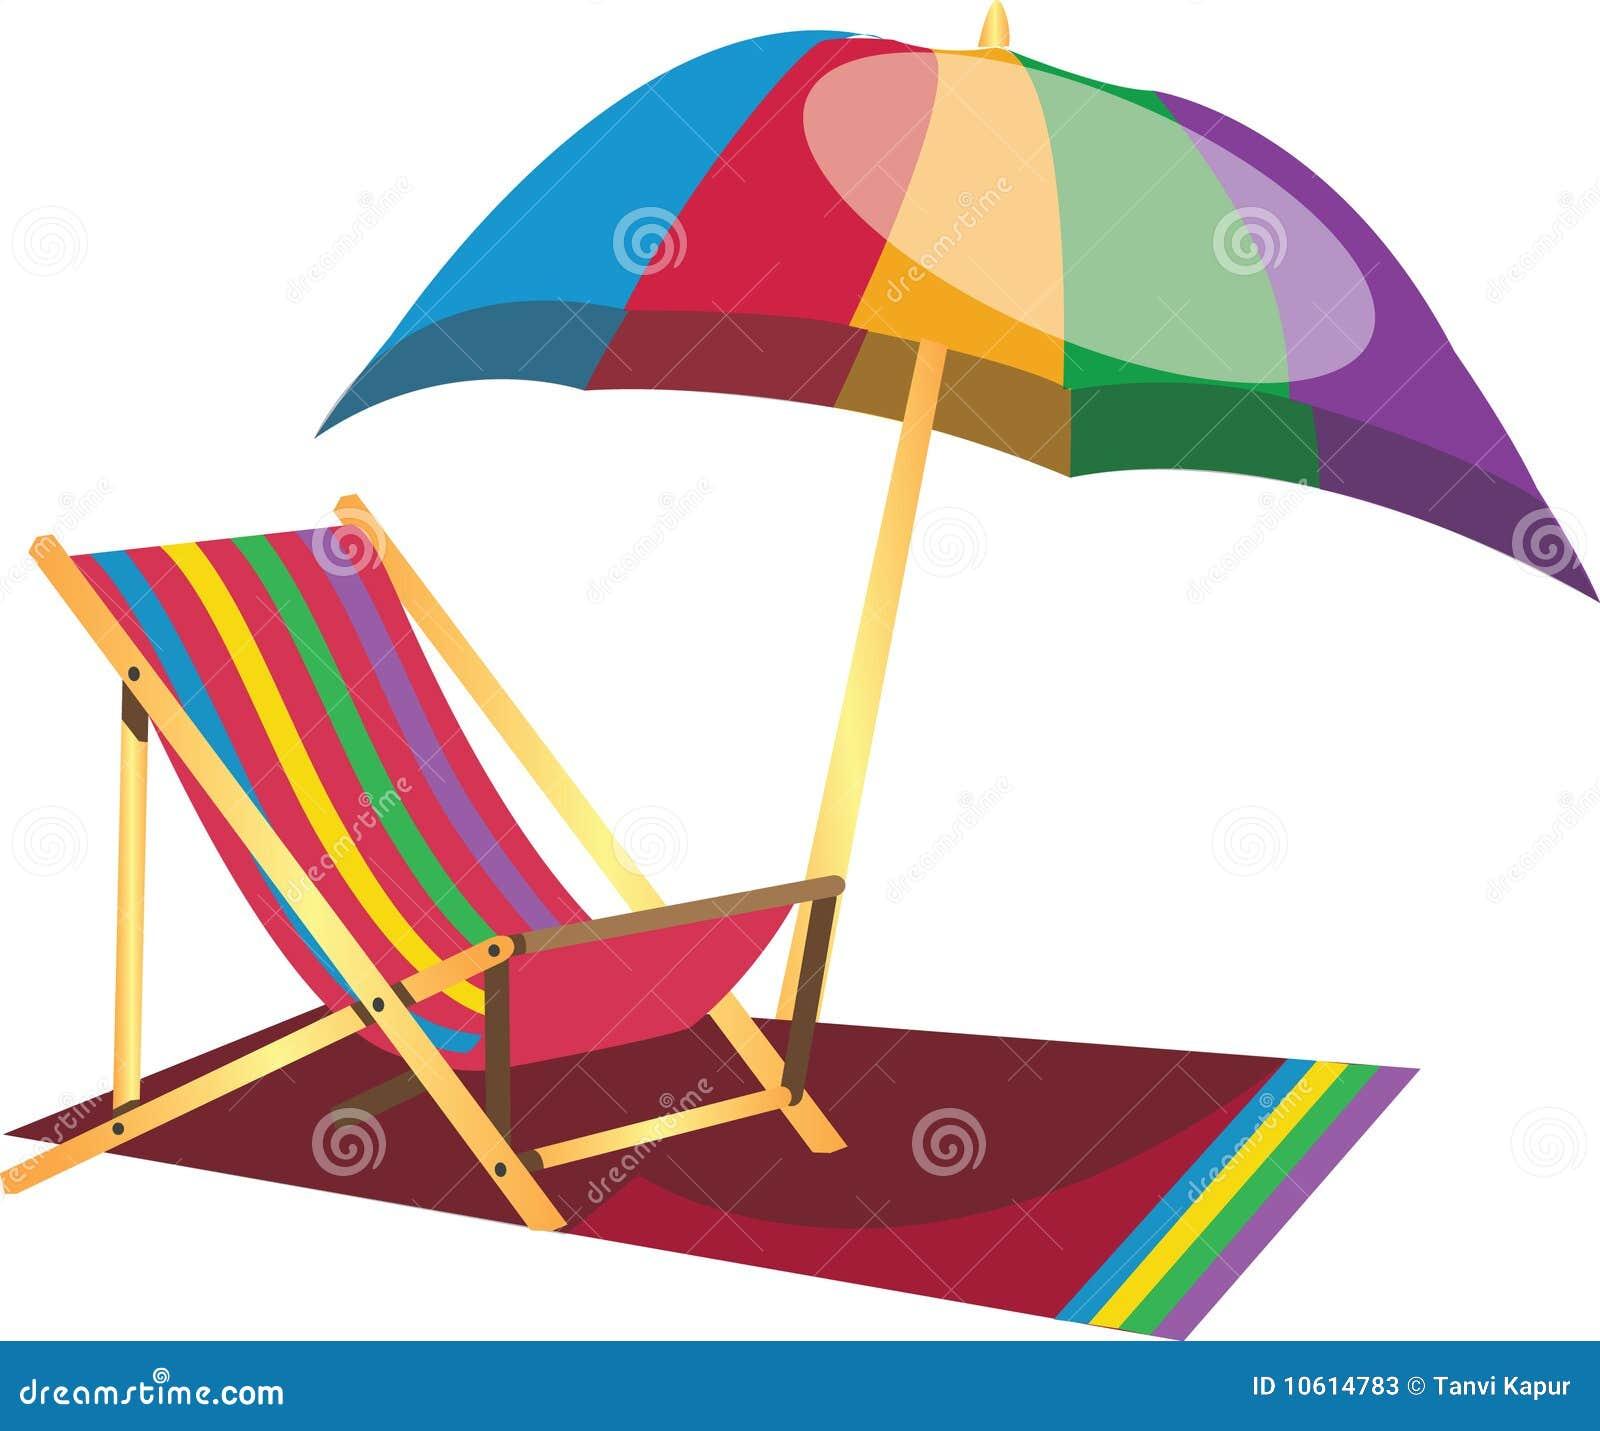 Free Vector Beach chair  Vecteezy